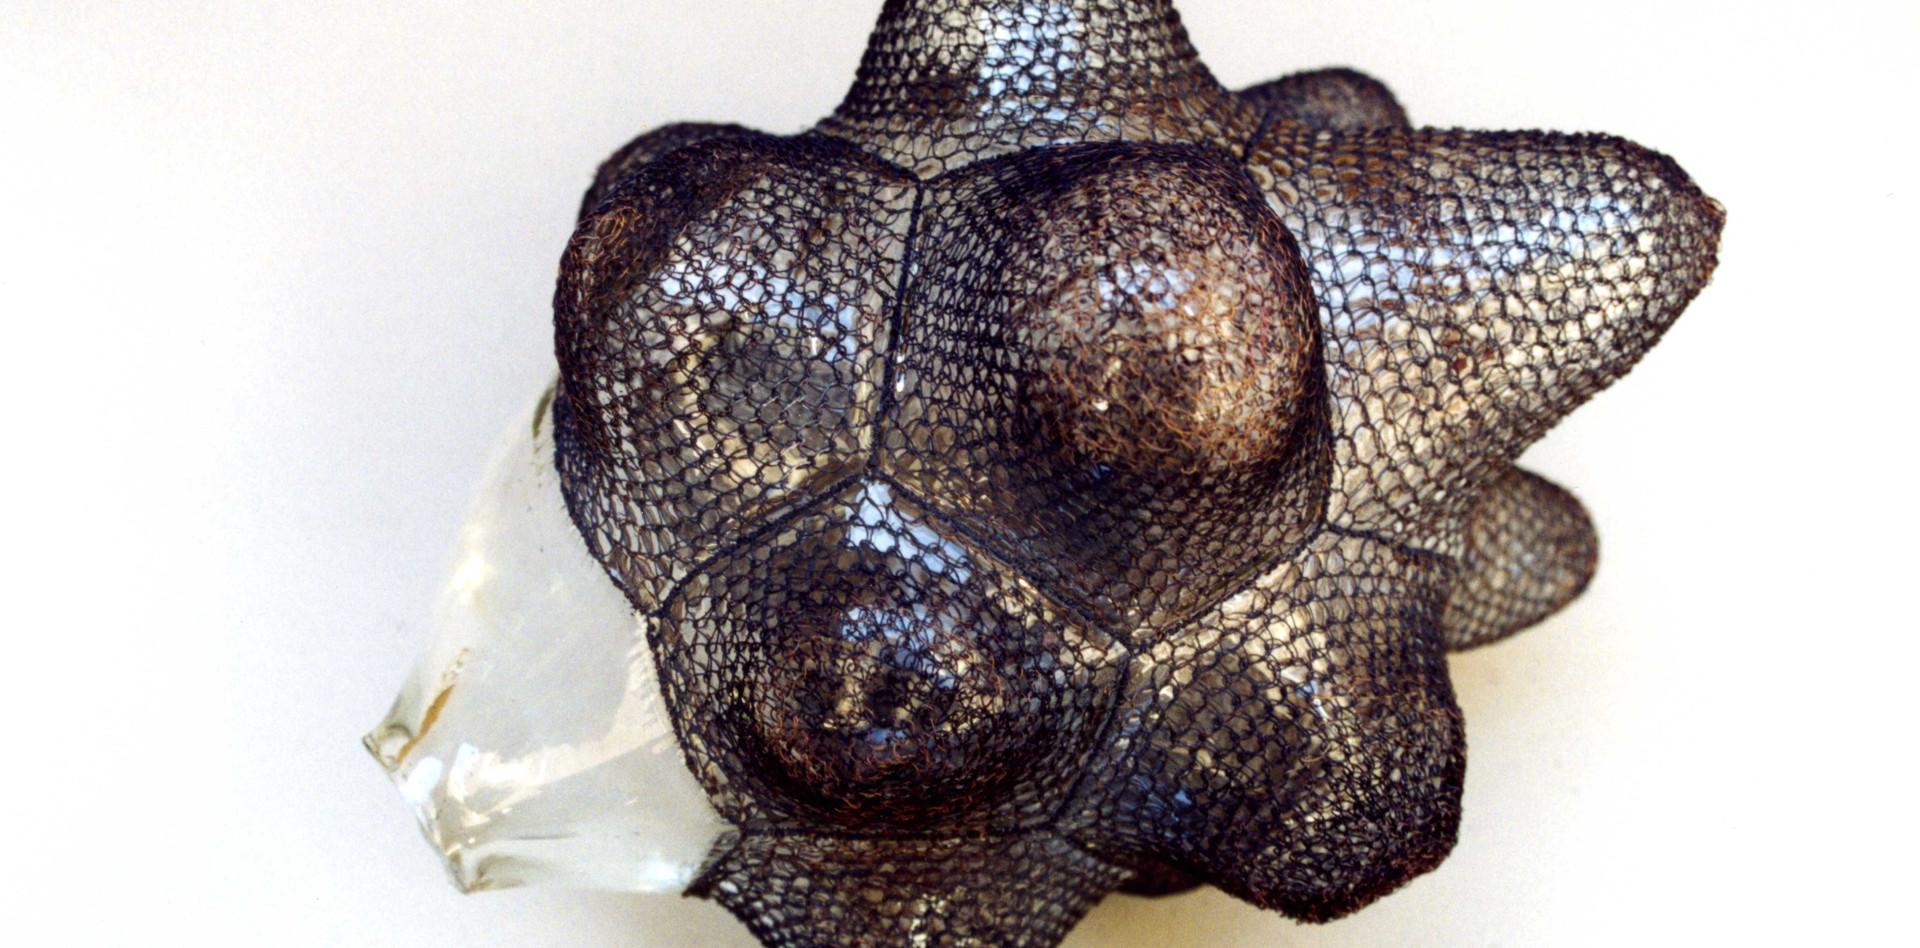 Objekt, Glas, Kupfer